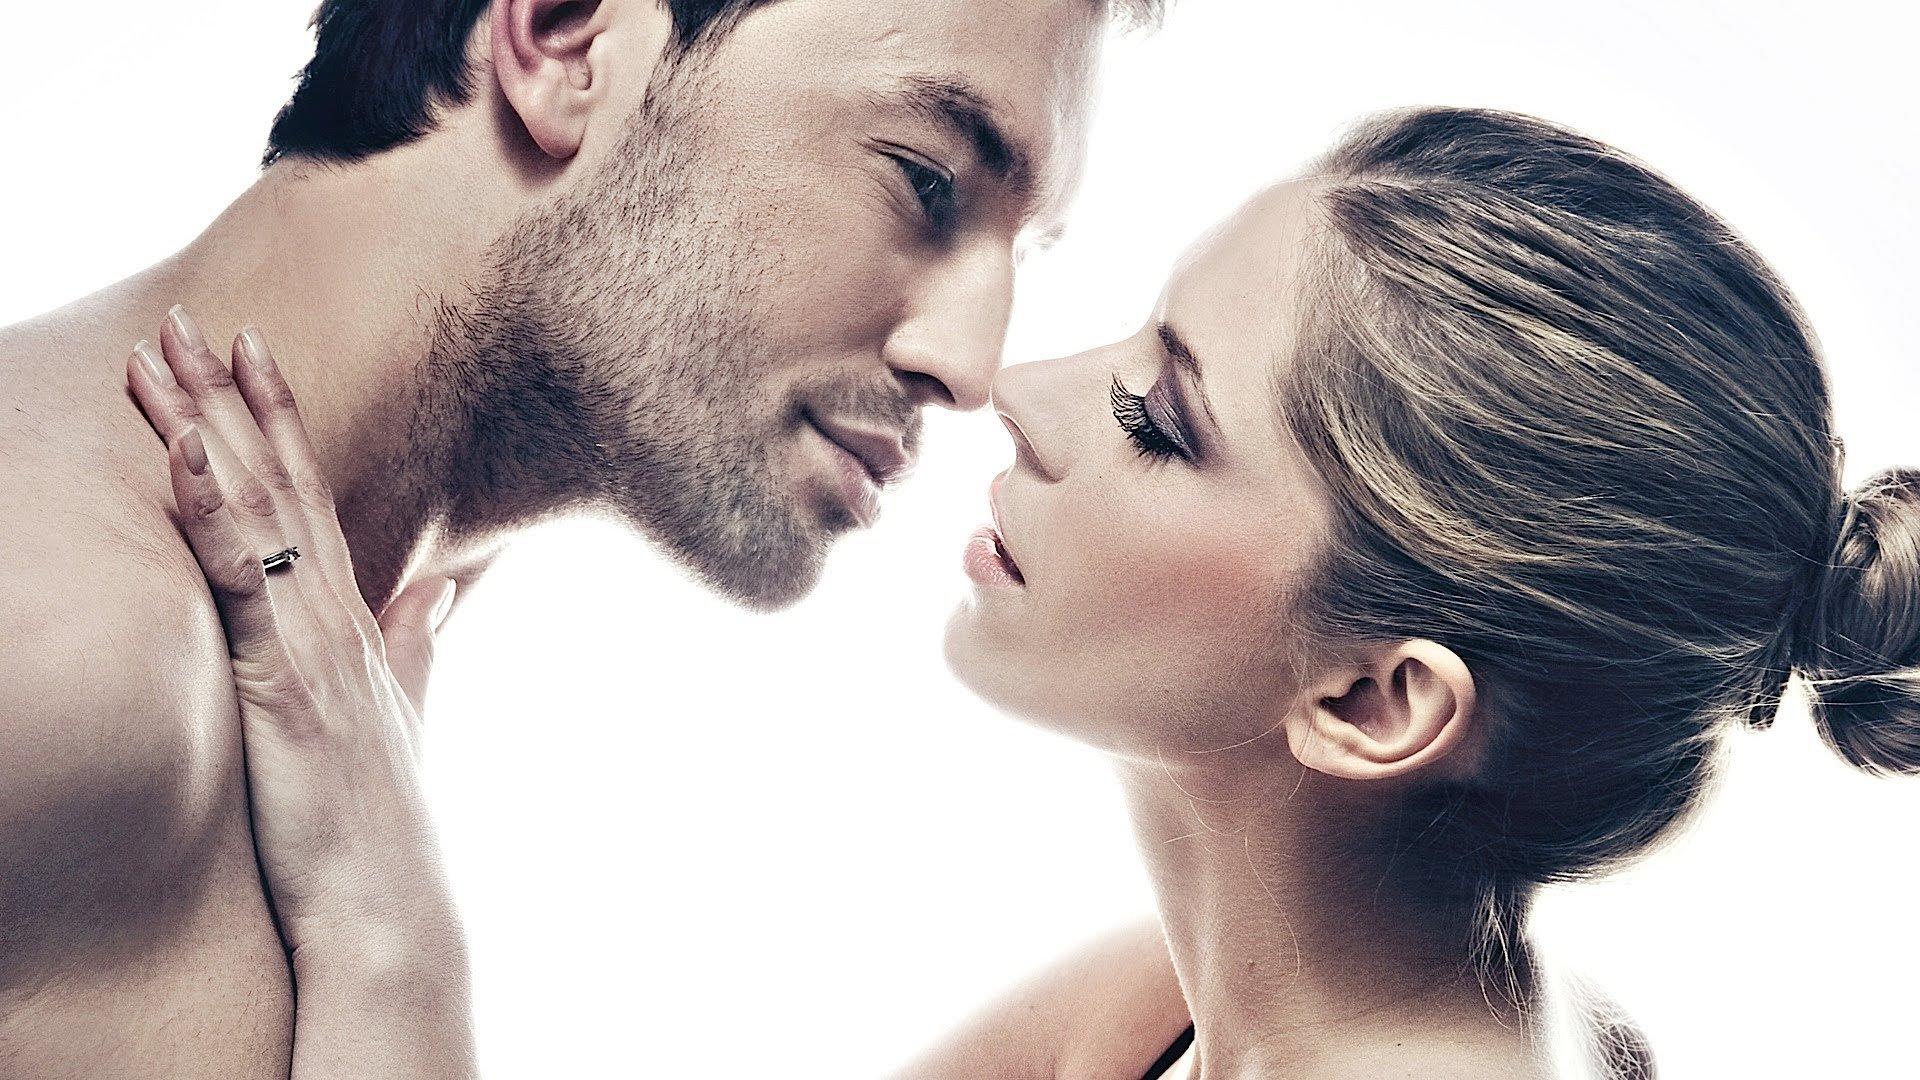 Картинки аву, картинки поцелуй мужчины и женщины